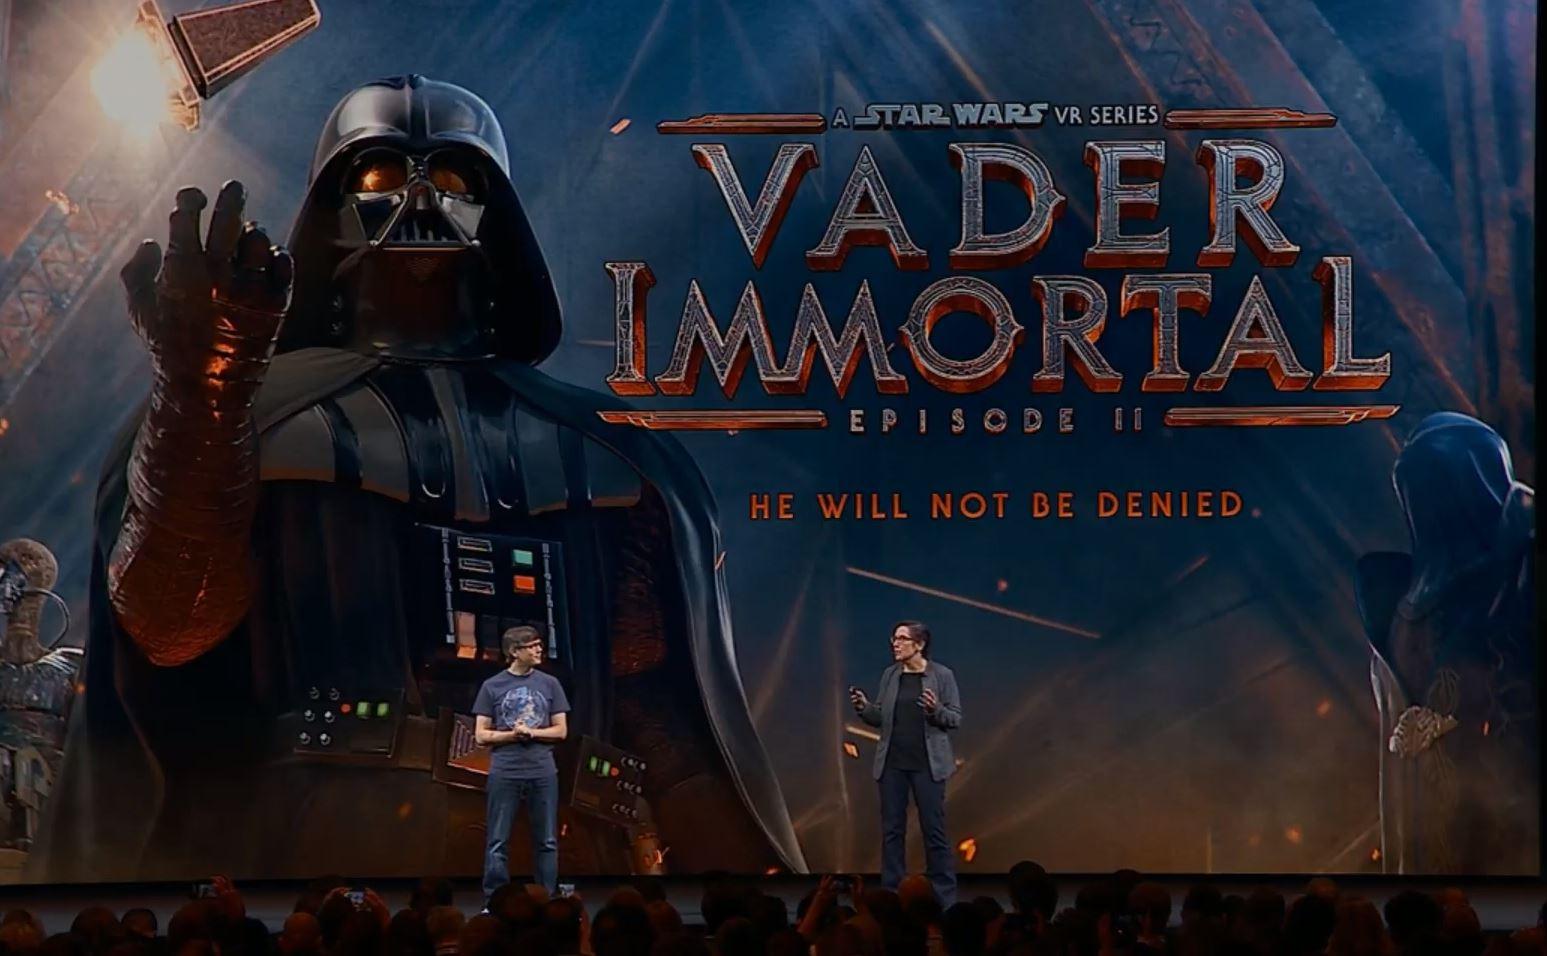 Vader Immortal Episode II ab sofort, Medal of Honor VR von Respawn für Rift S